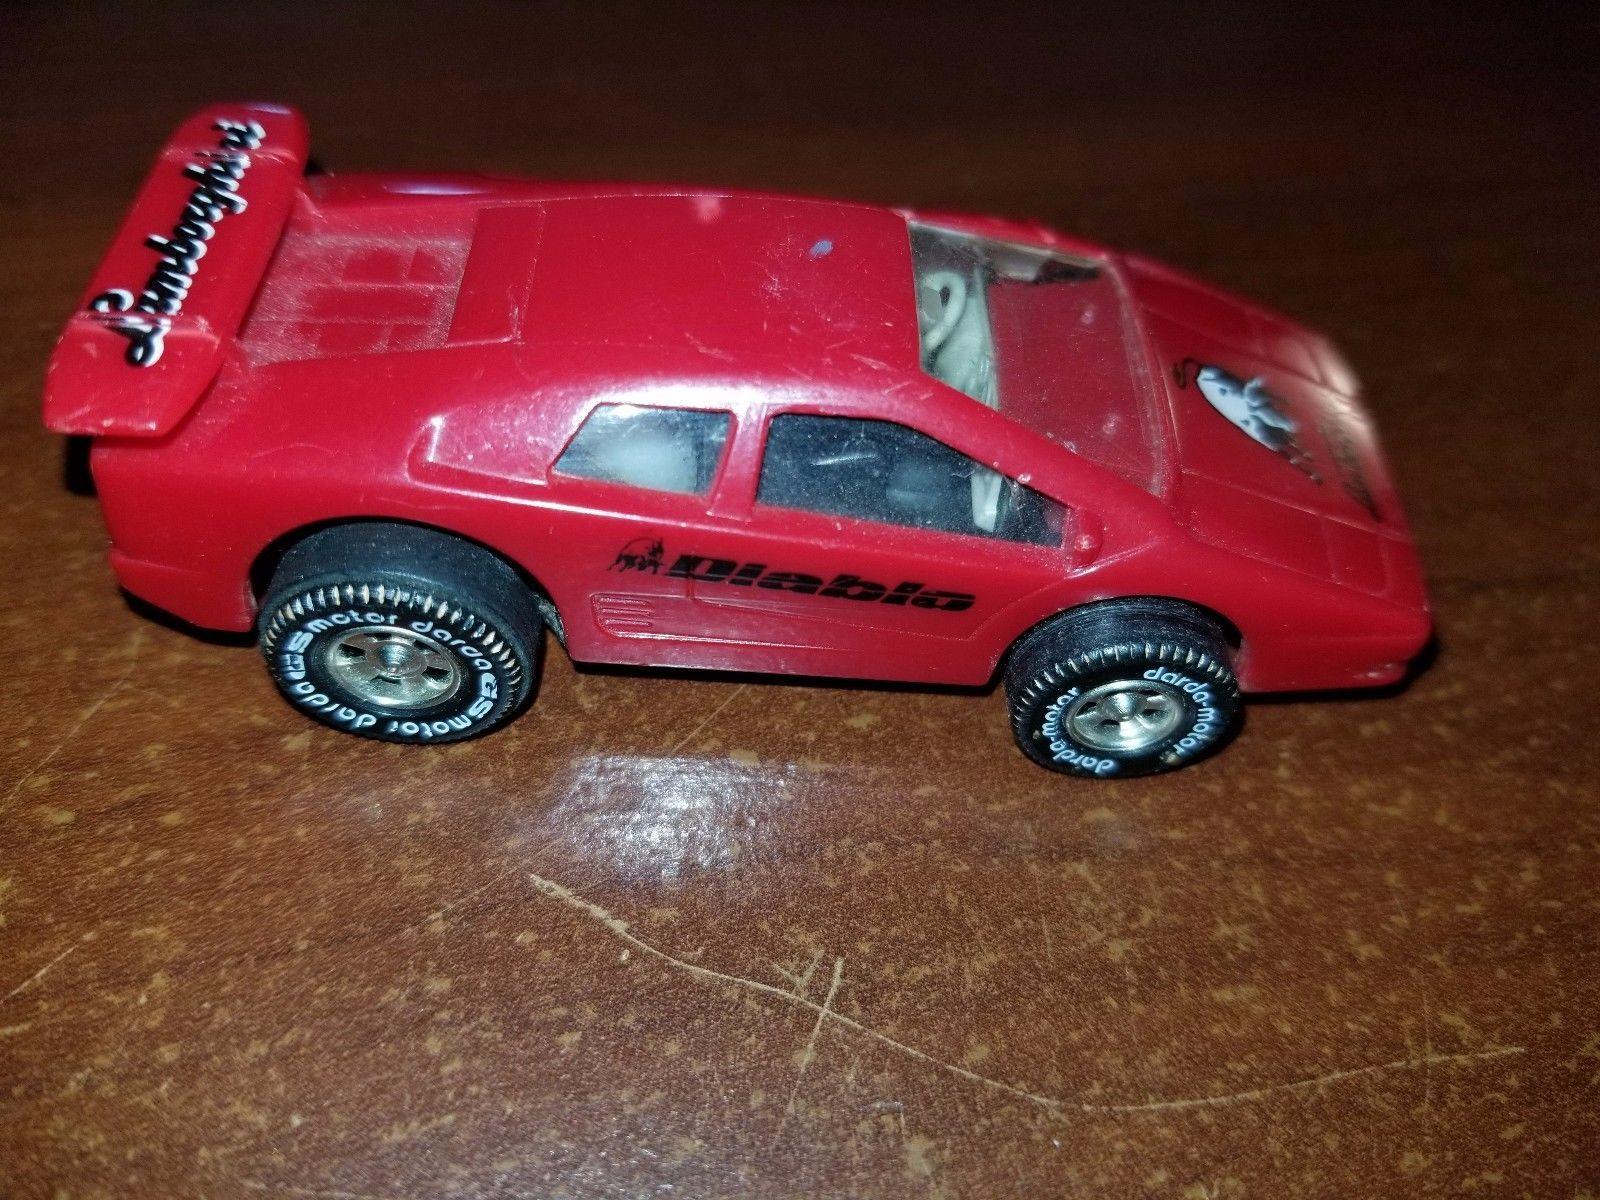 80s car toys  Cool Awesome VINTAGE DARDA MOTOR CAR RED LAMBORGHINI DIABLO BOX A